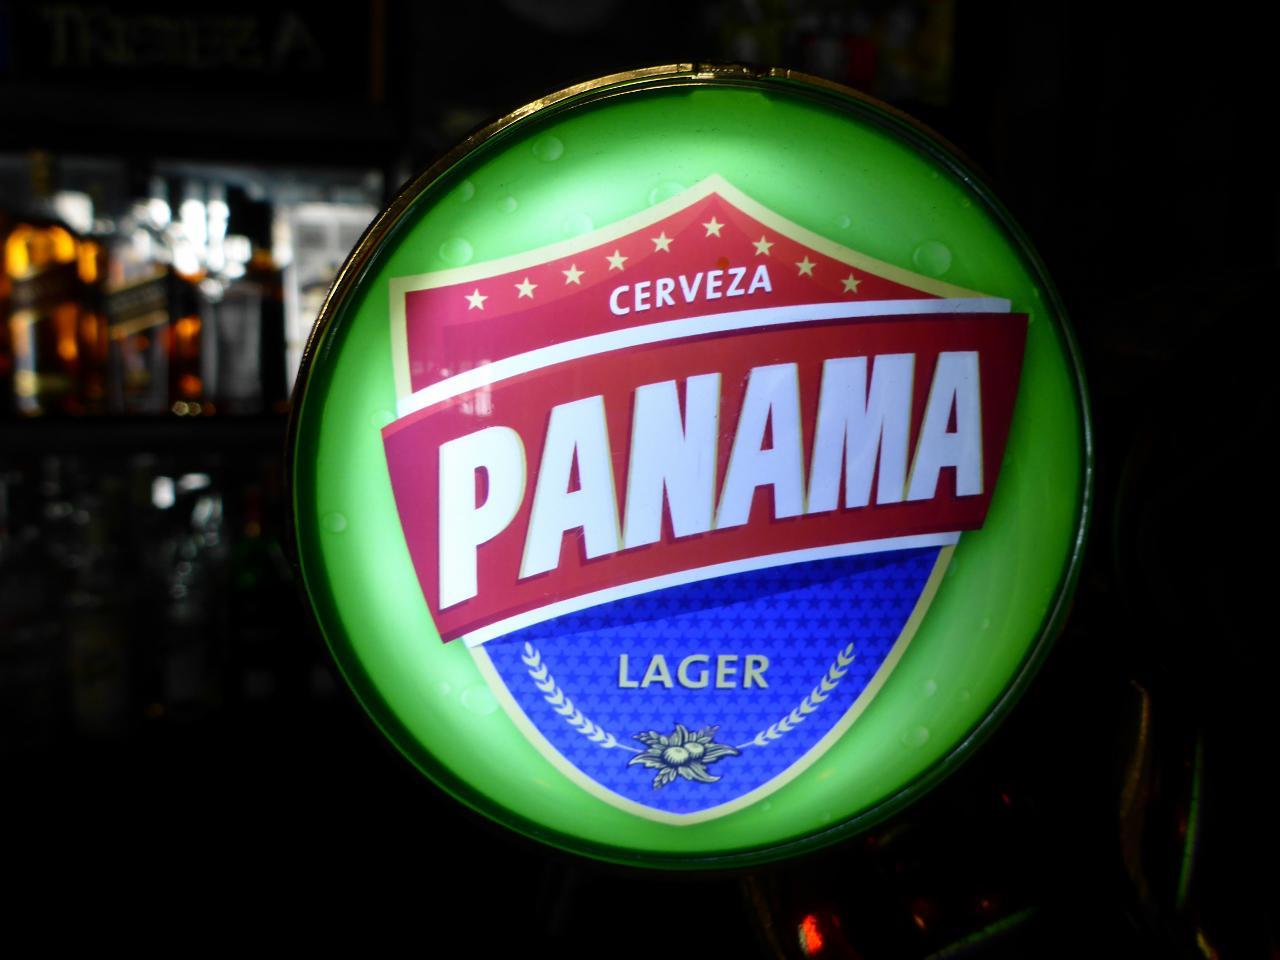 A fine beer.